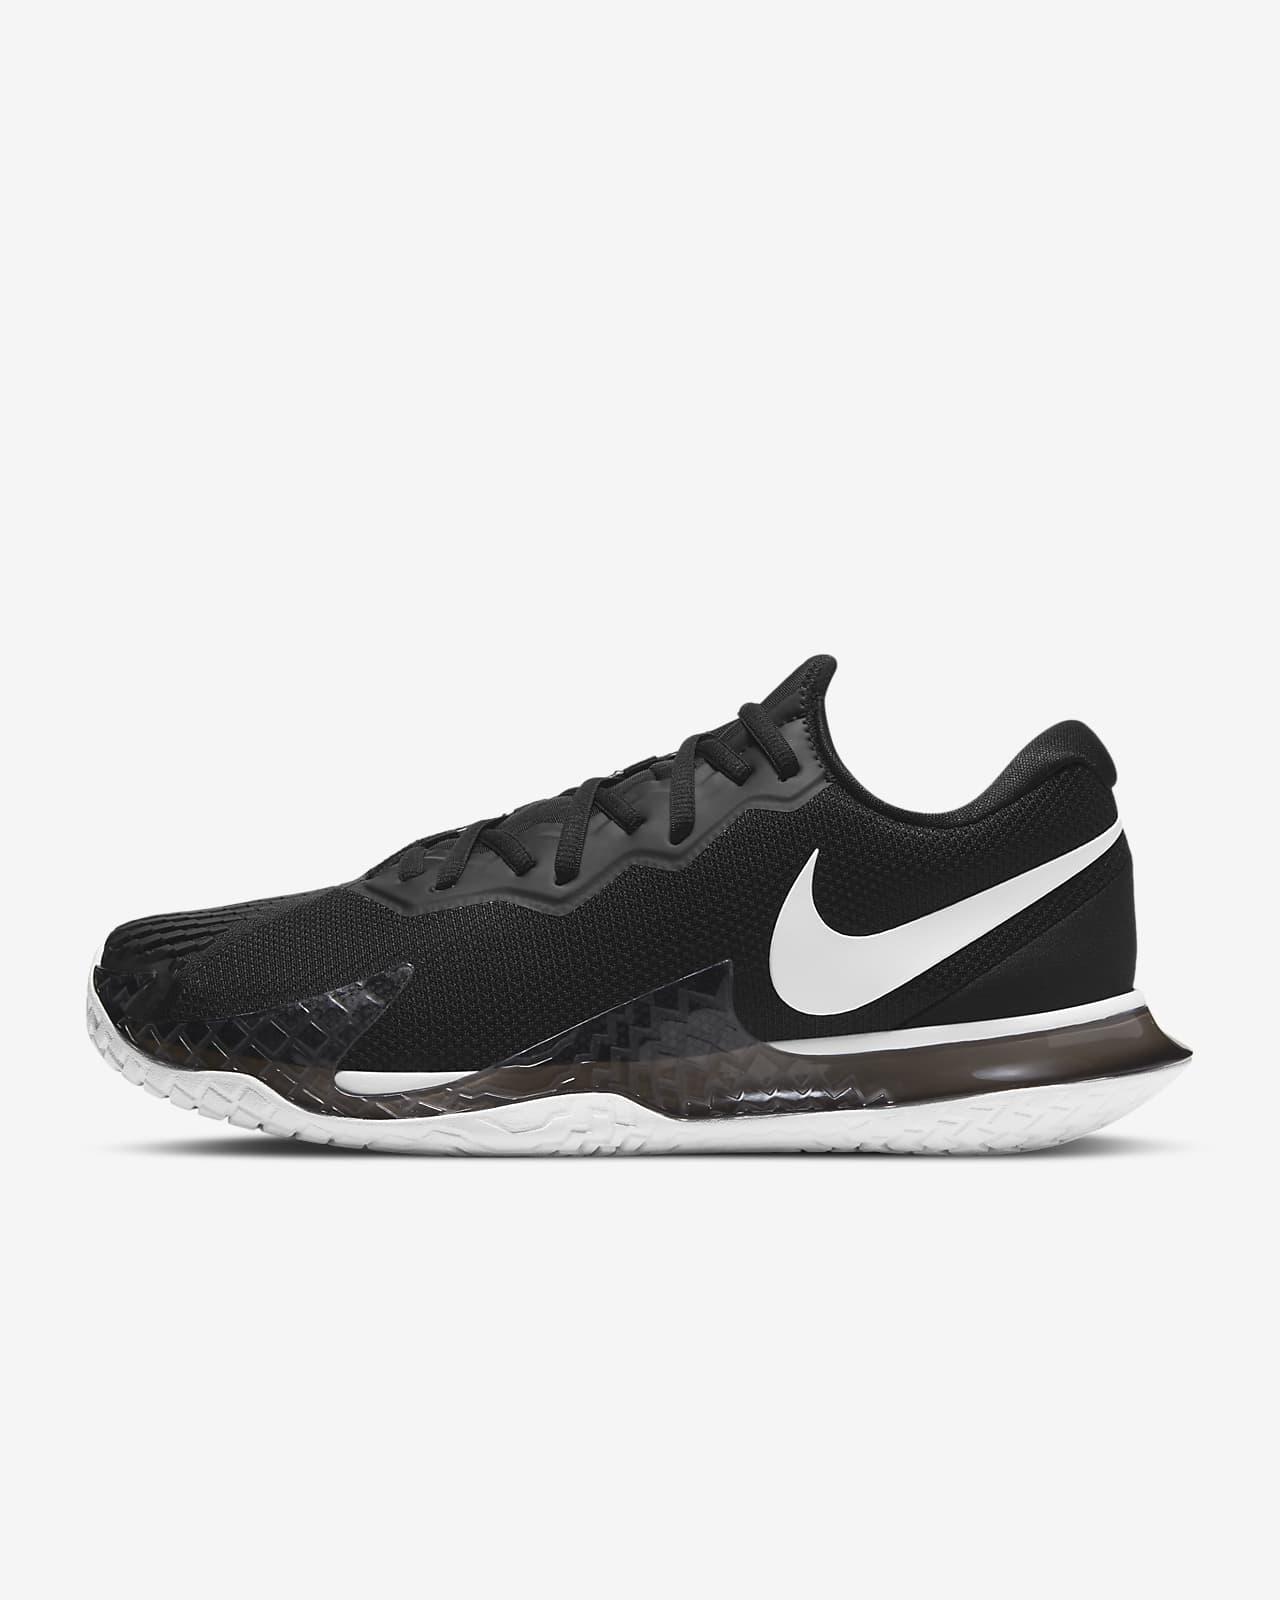 NikeCourt Air Zoom Vapor Cage 4 Men's Hard Court Tennis Shoe